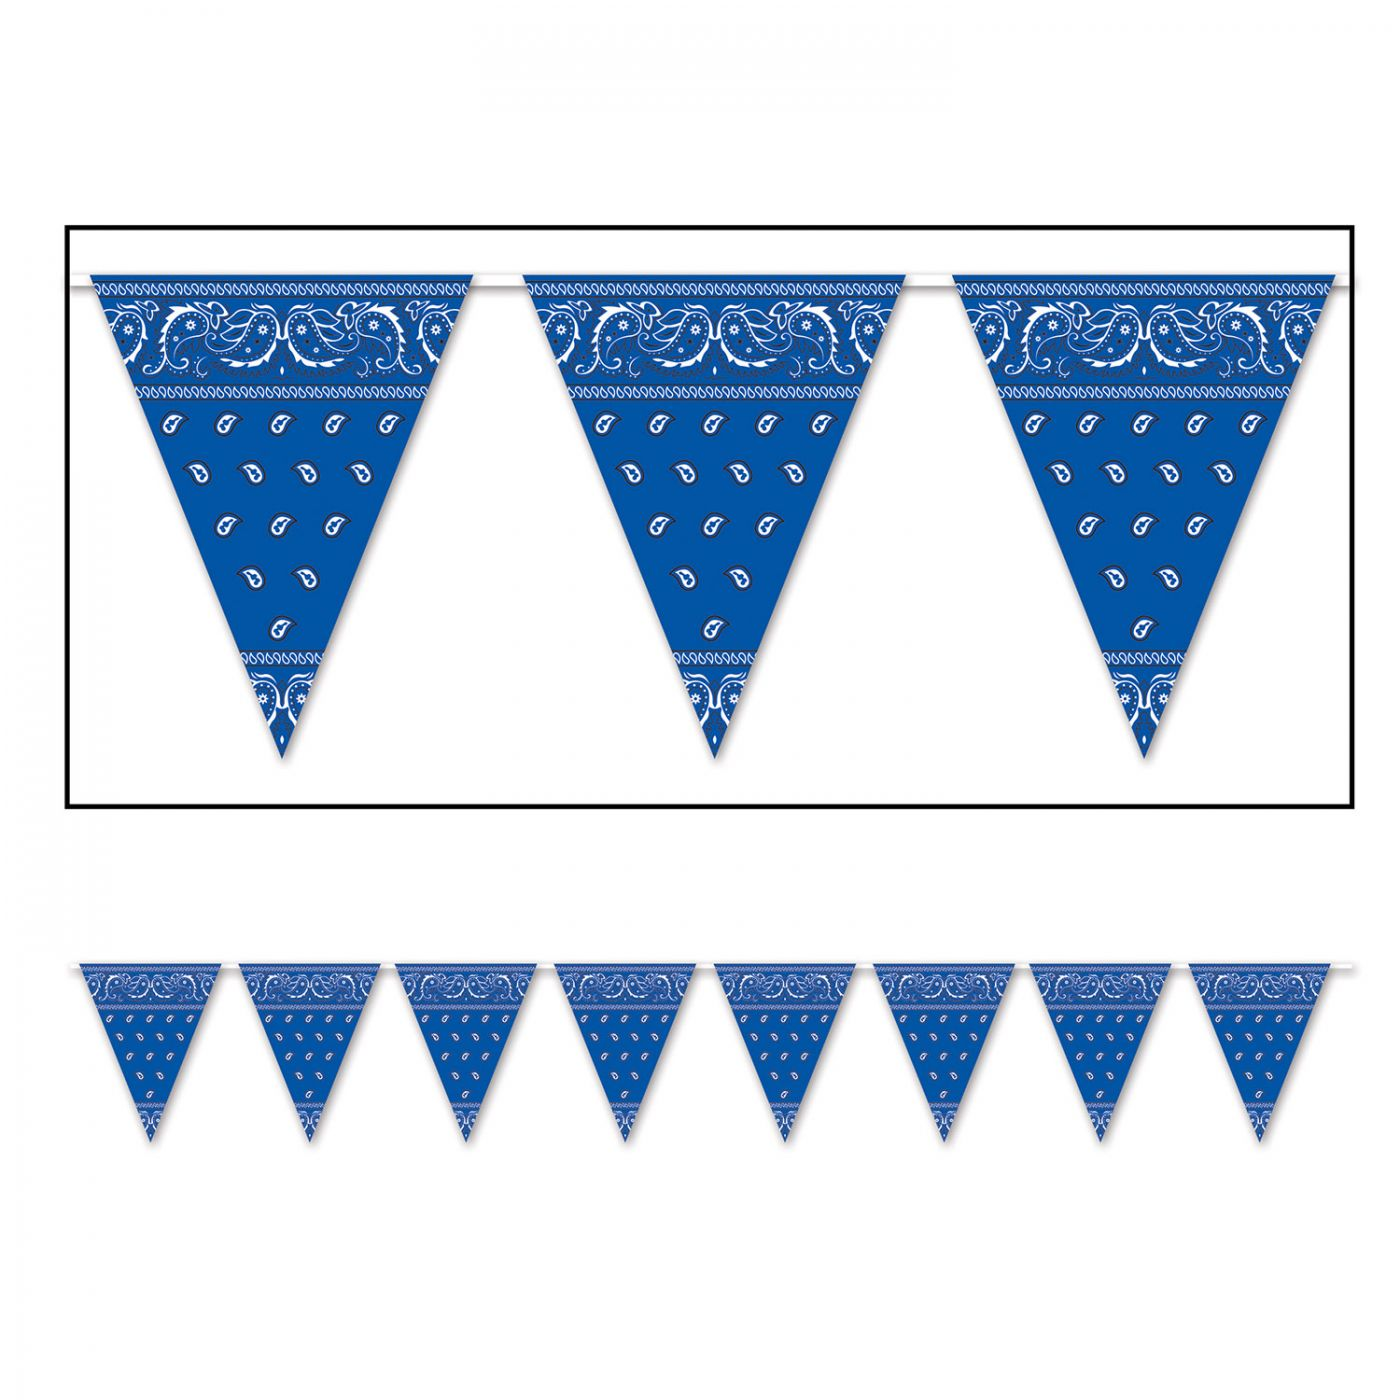 Image of Bandana Pennant Banner